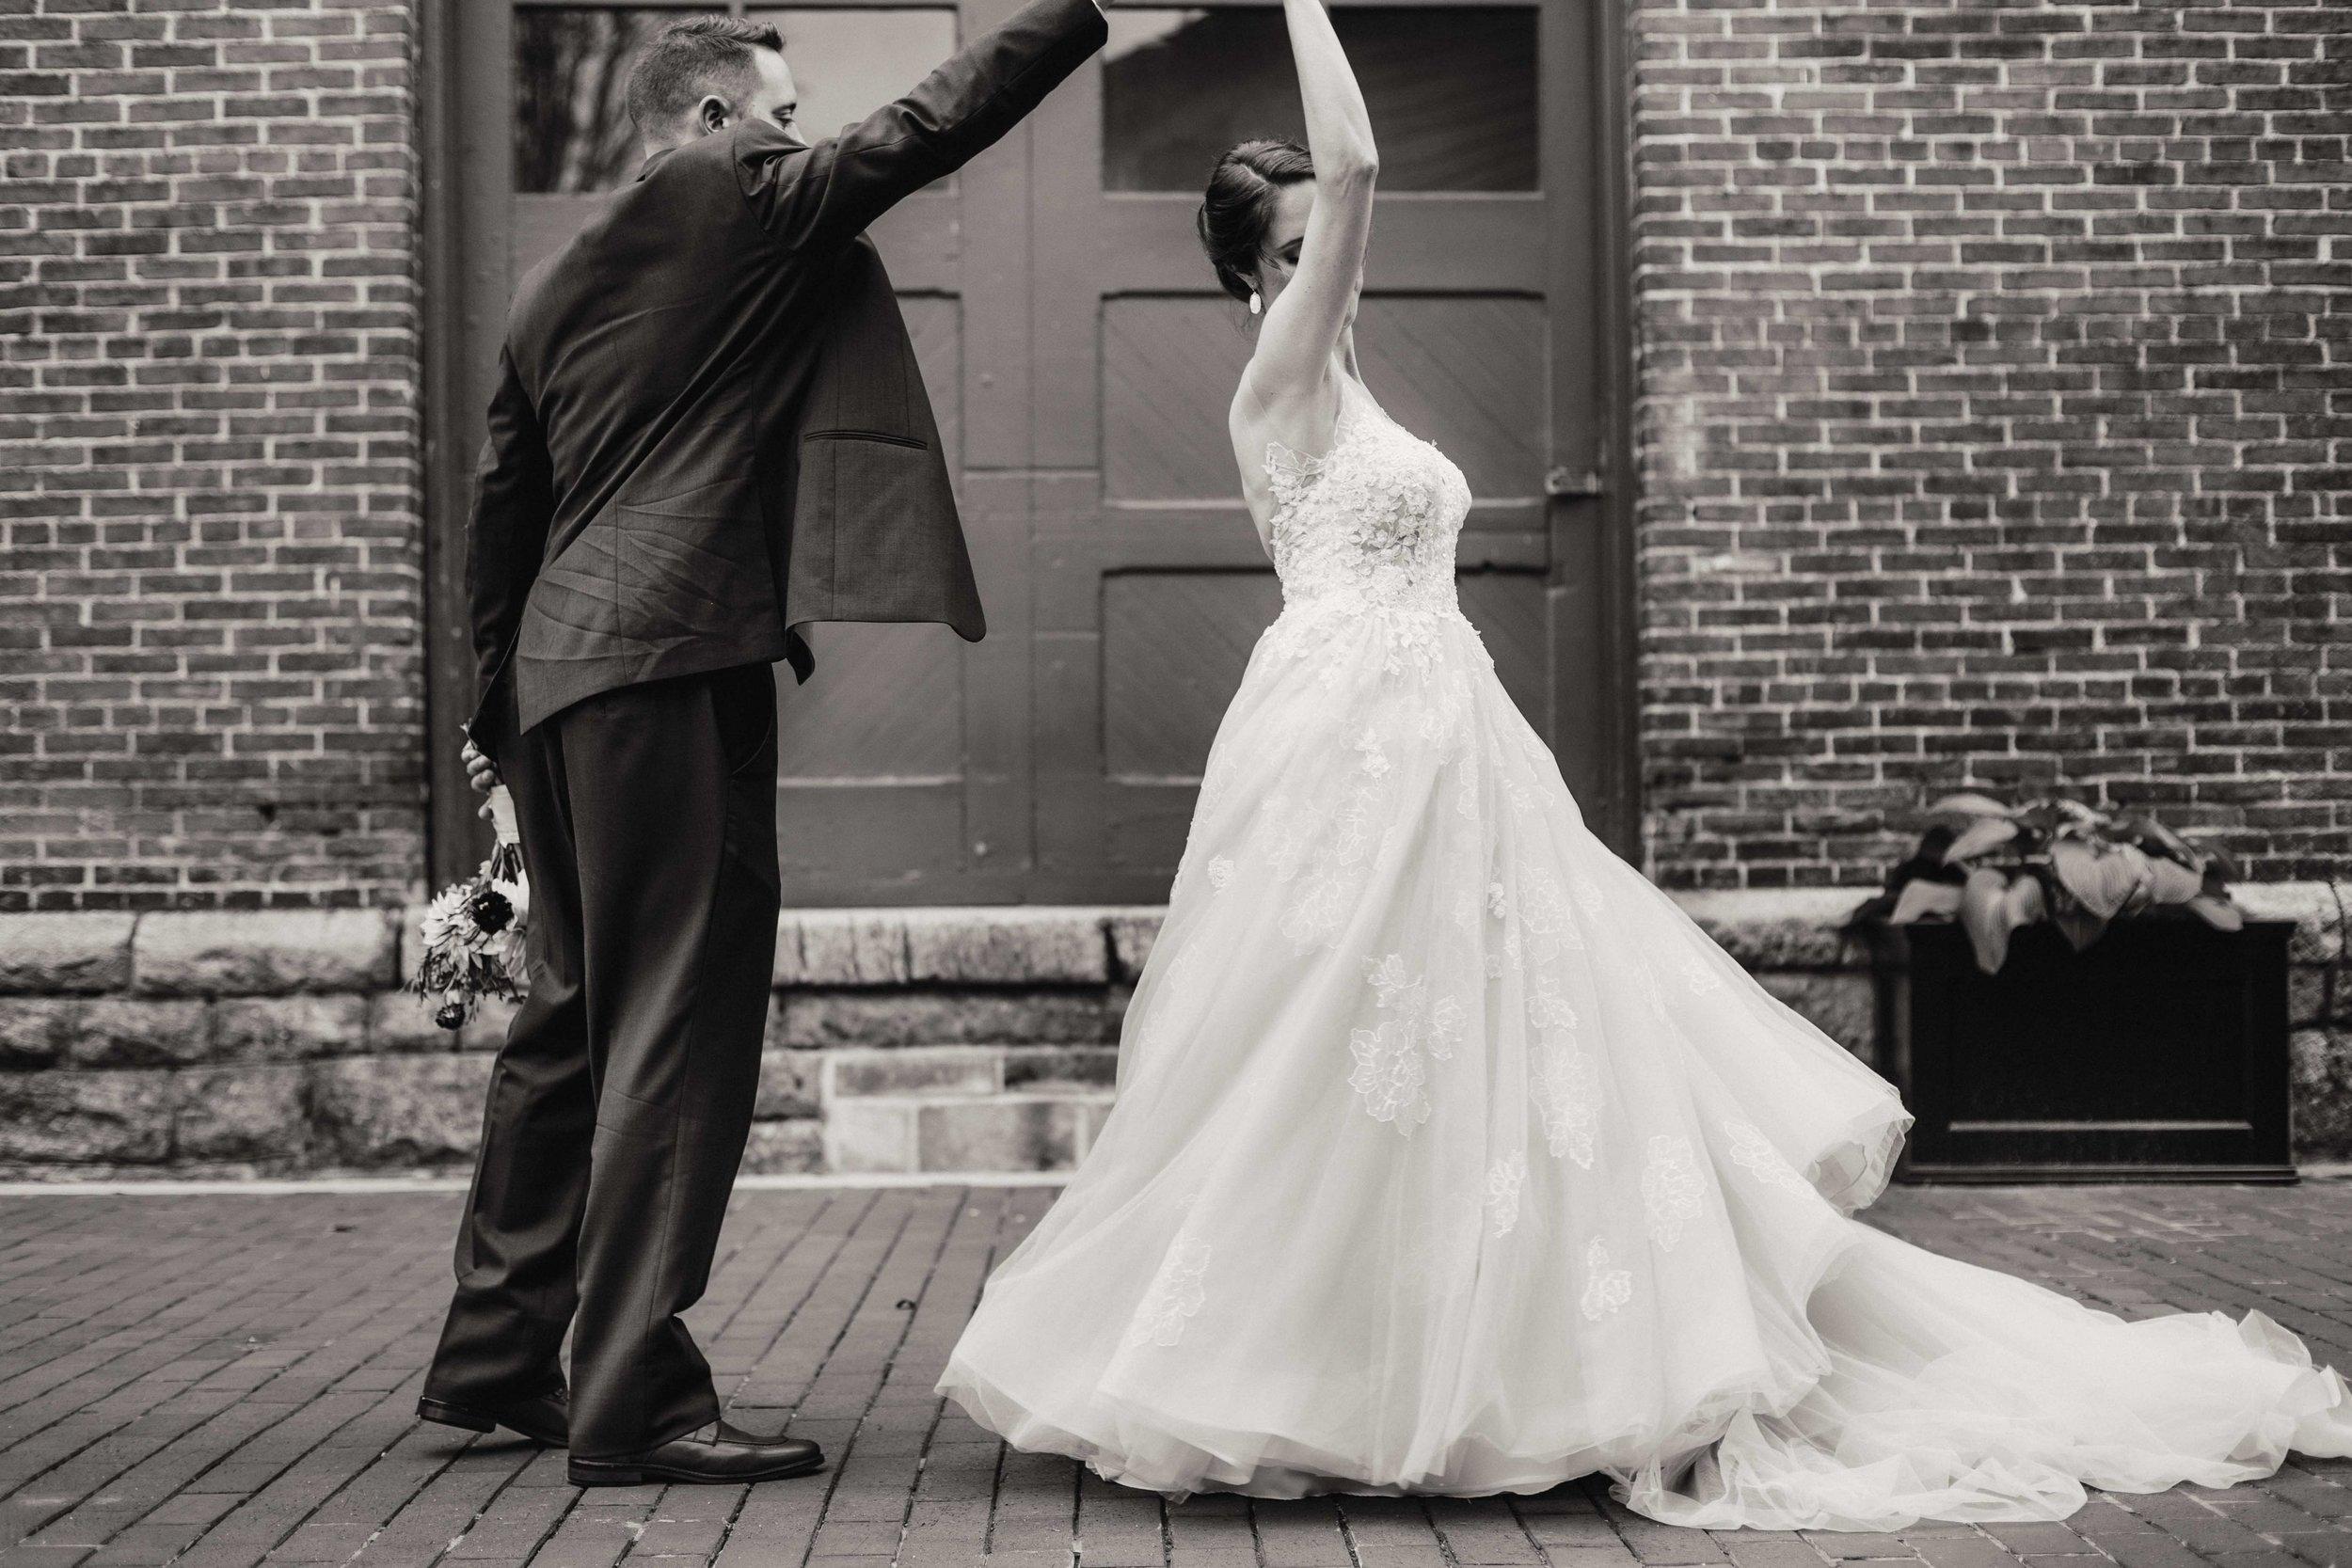 main-street-ballroom-ellicott-city-september-wedding.jpg